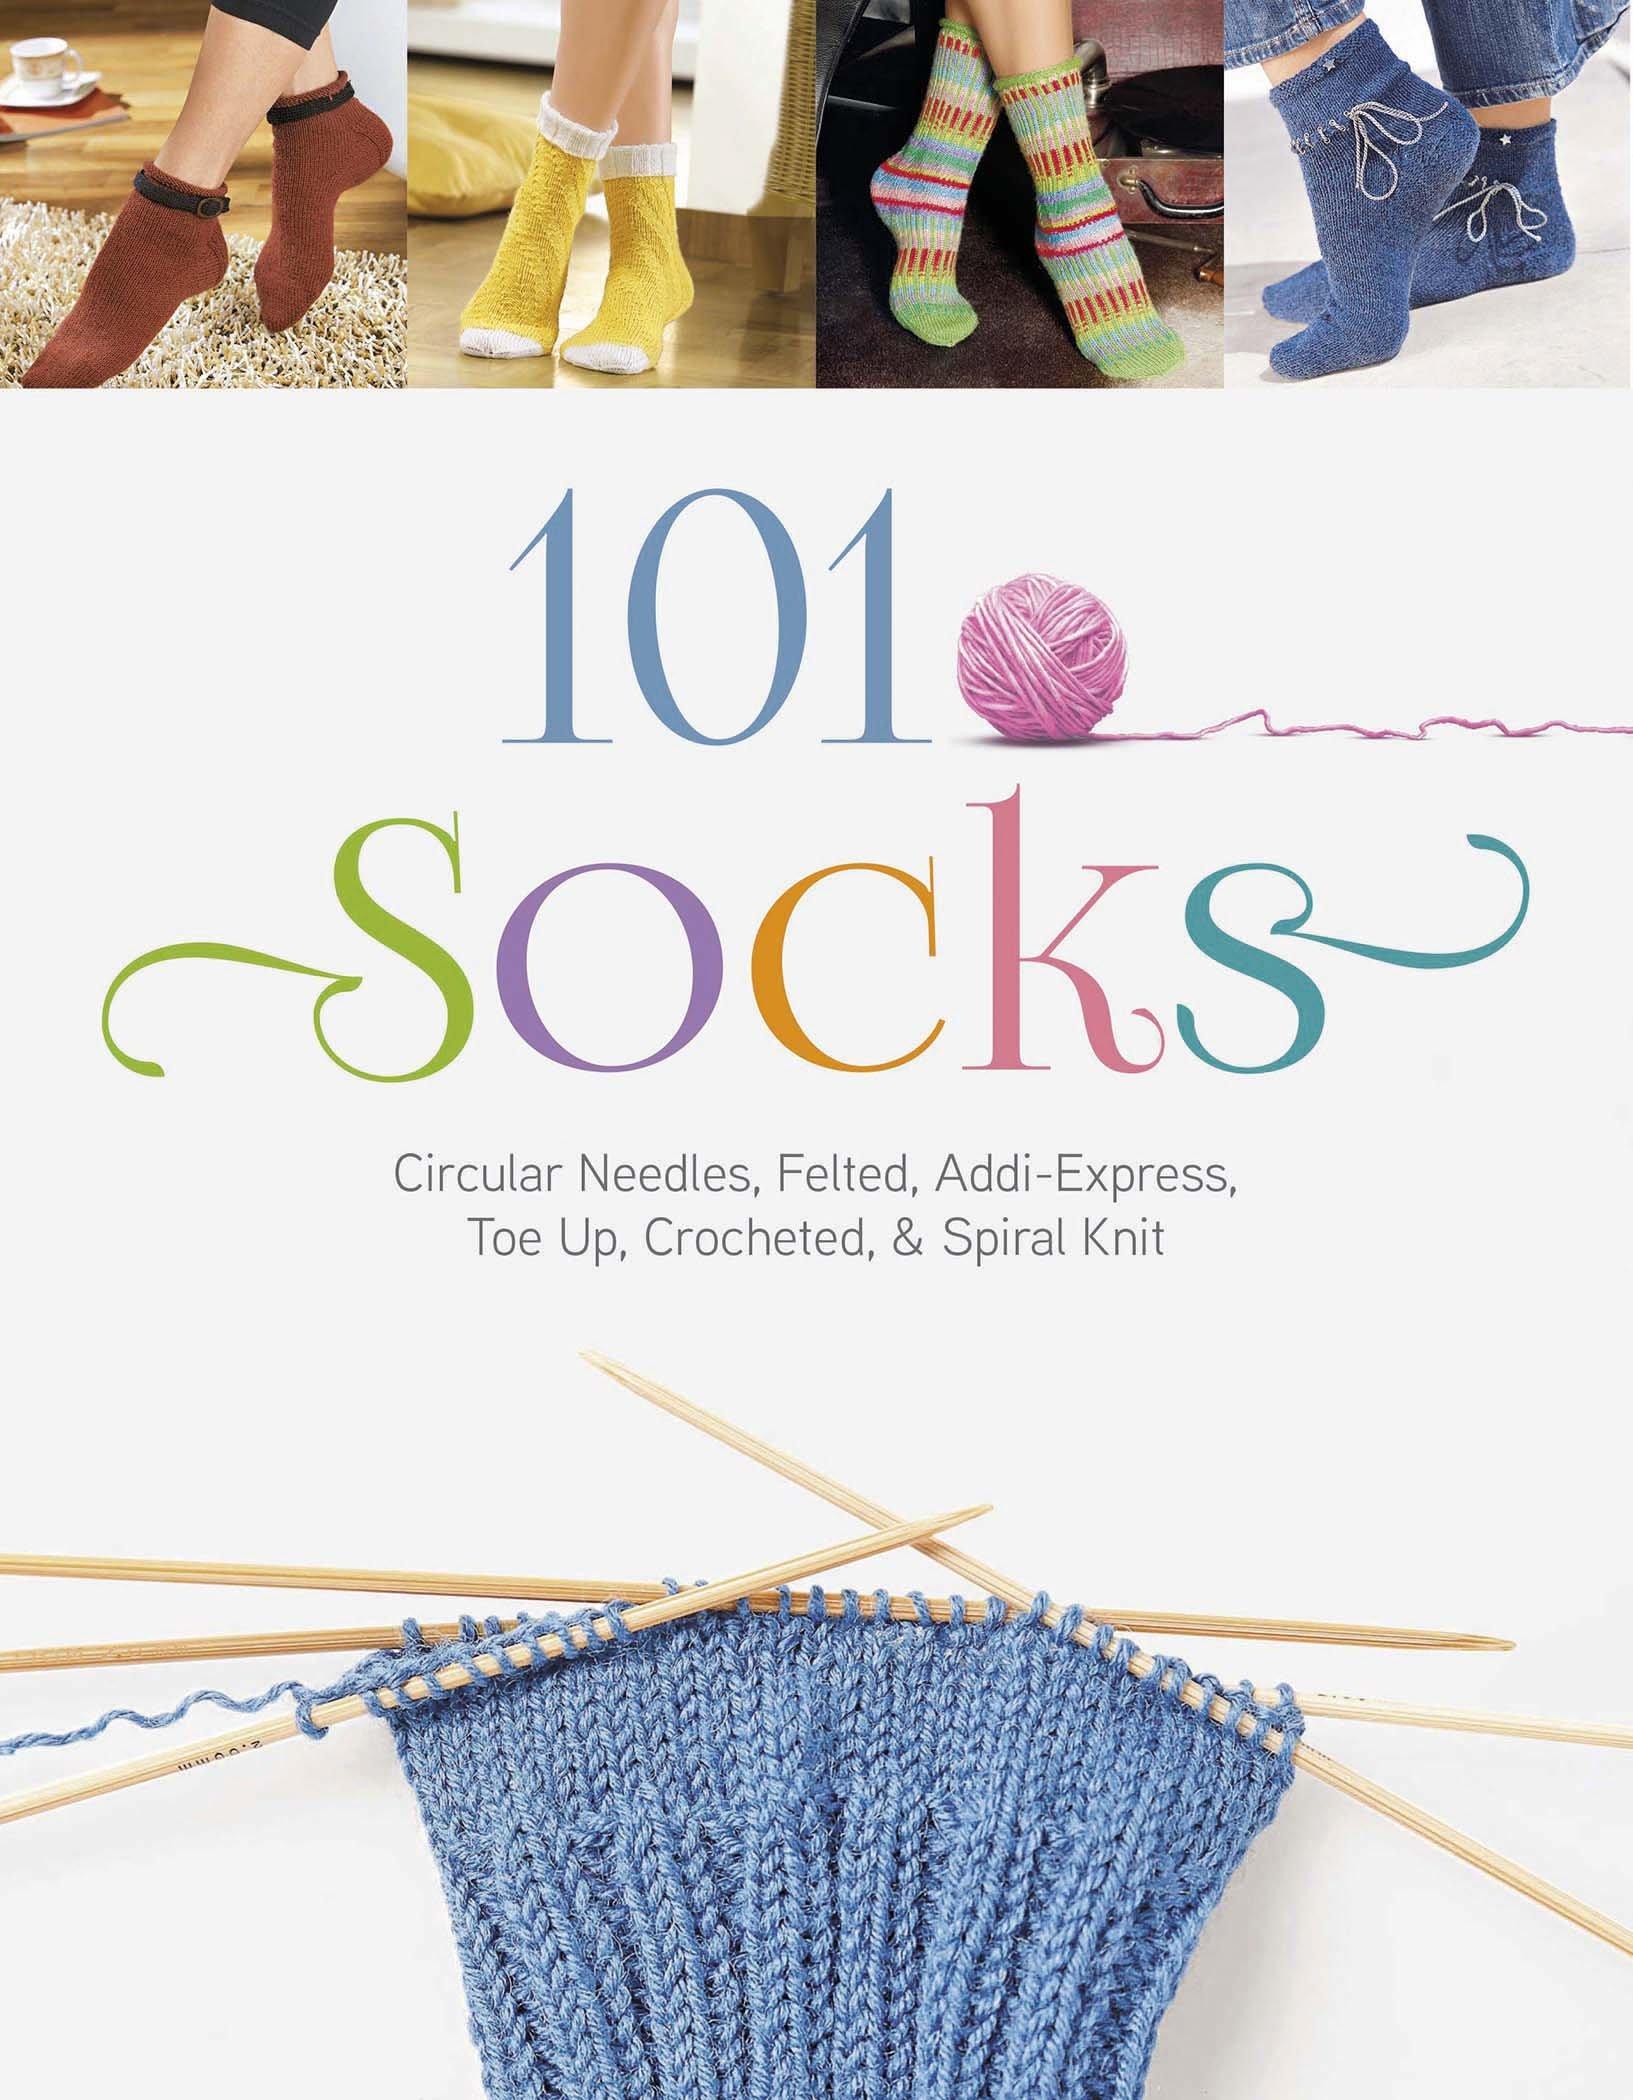 101 Socks: Circular Needles, Felted, Addi-Express, Toe Up, Crocheted ...